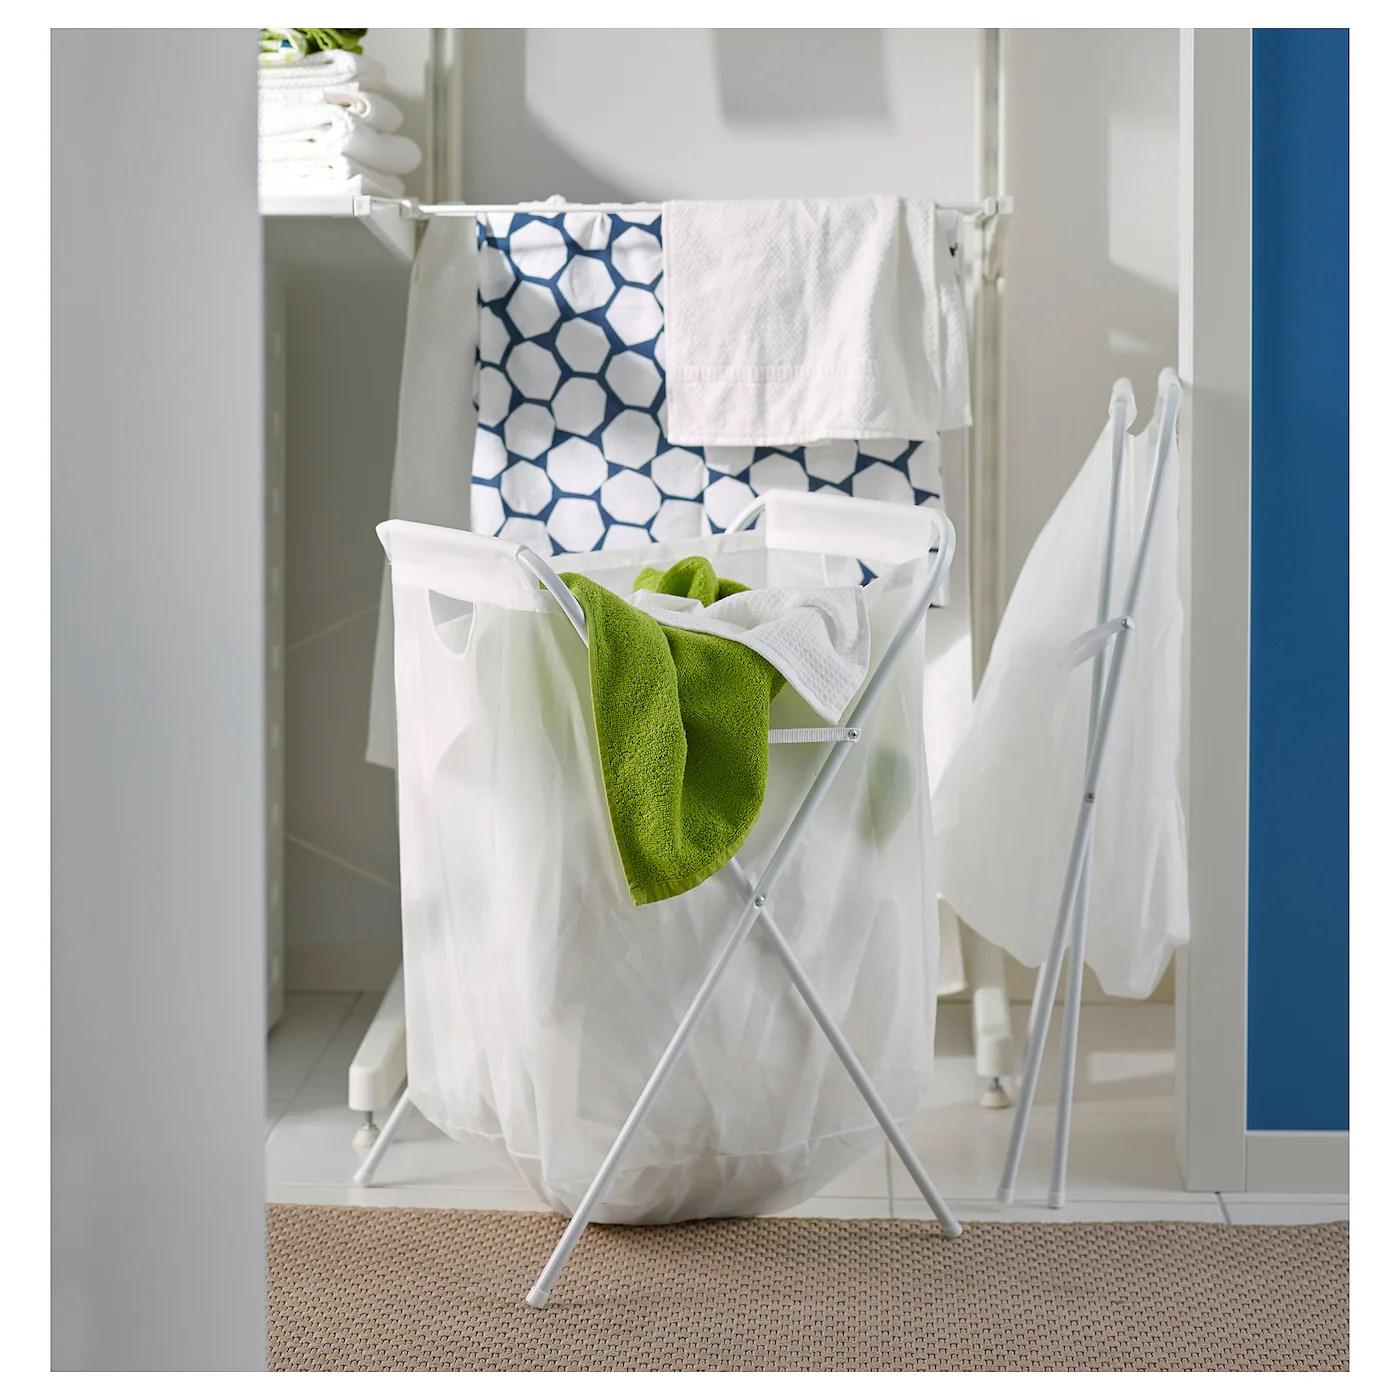 Jall Sac A Linge Et Support Blanc Ikea